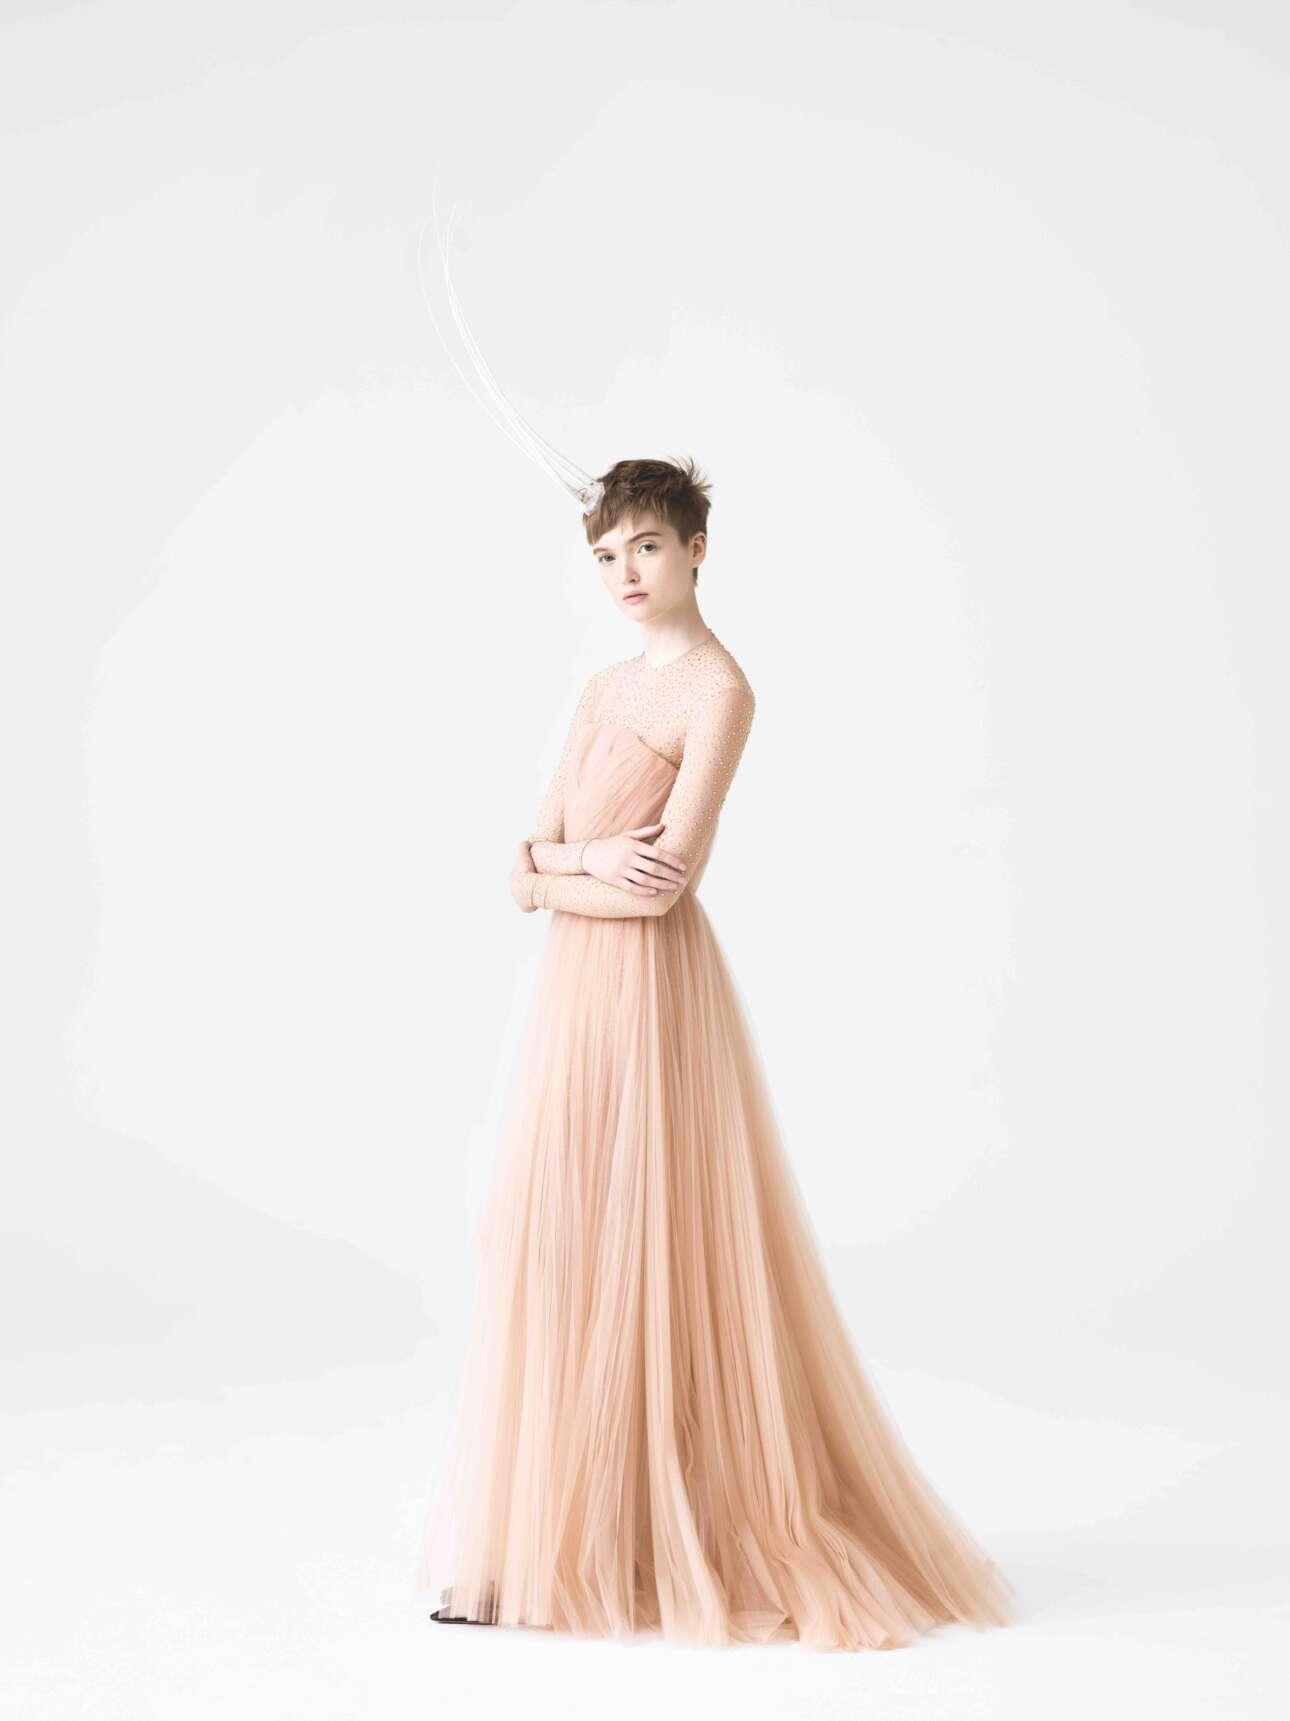 H Ρουθ Μπελ σε μία αιθέρια και ρομαντική φωτογράφιση για λογαριασμό του κινεζικού περιοδικού T magazine, τον Απρίλιο του 2017